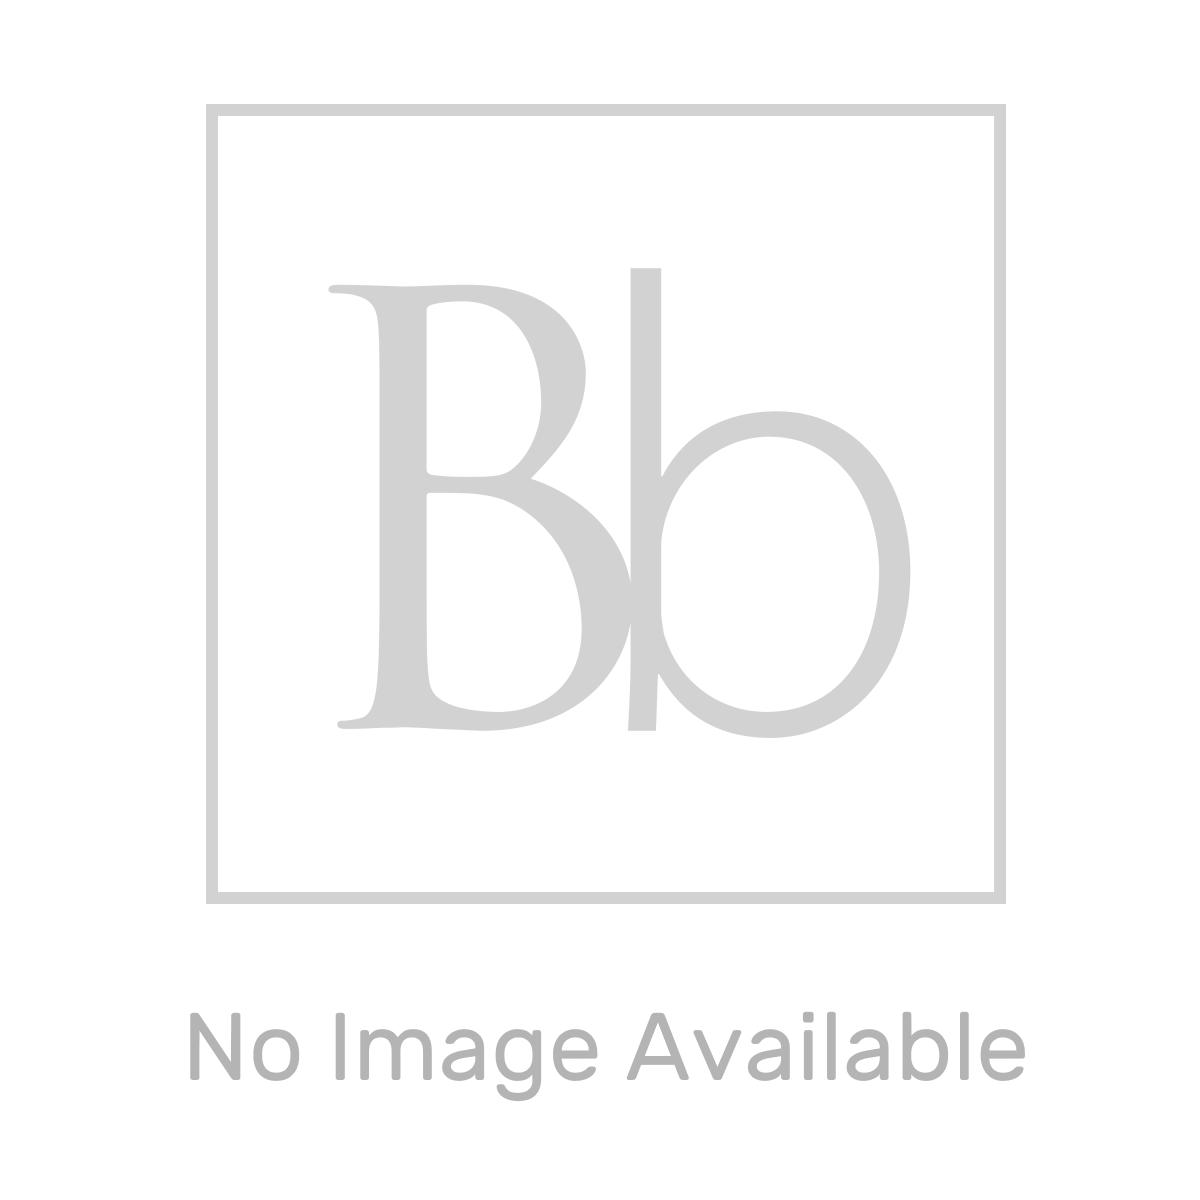 RAK Series 600 Short Projection Toilet with Sandwich Soft Close Seat